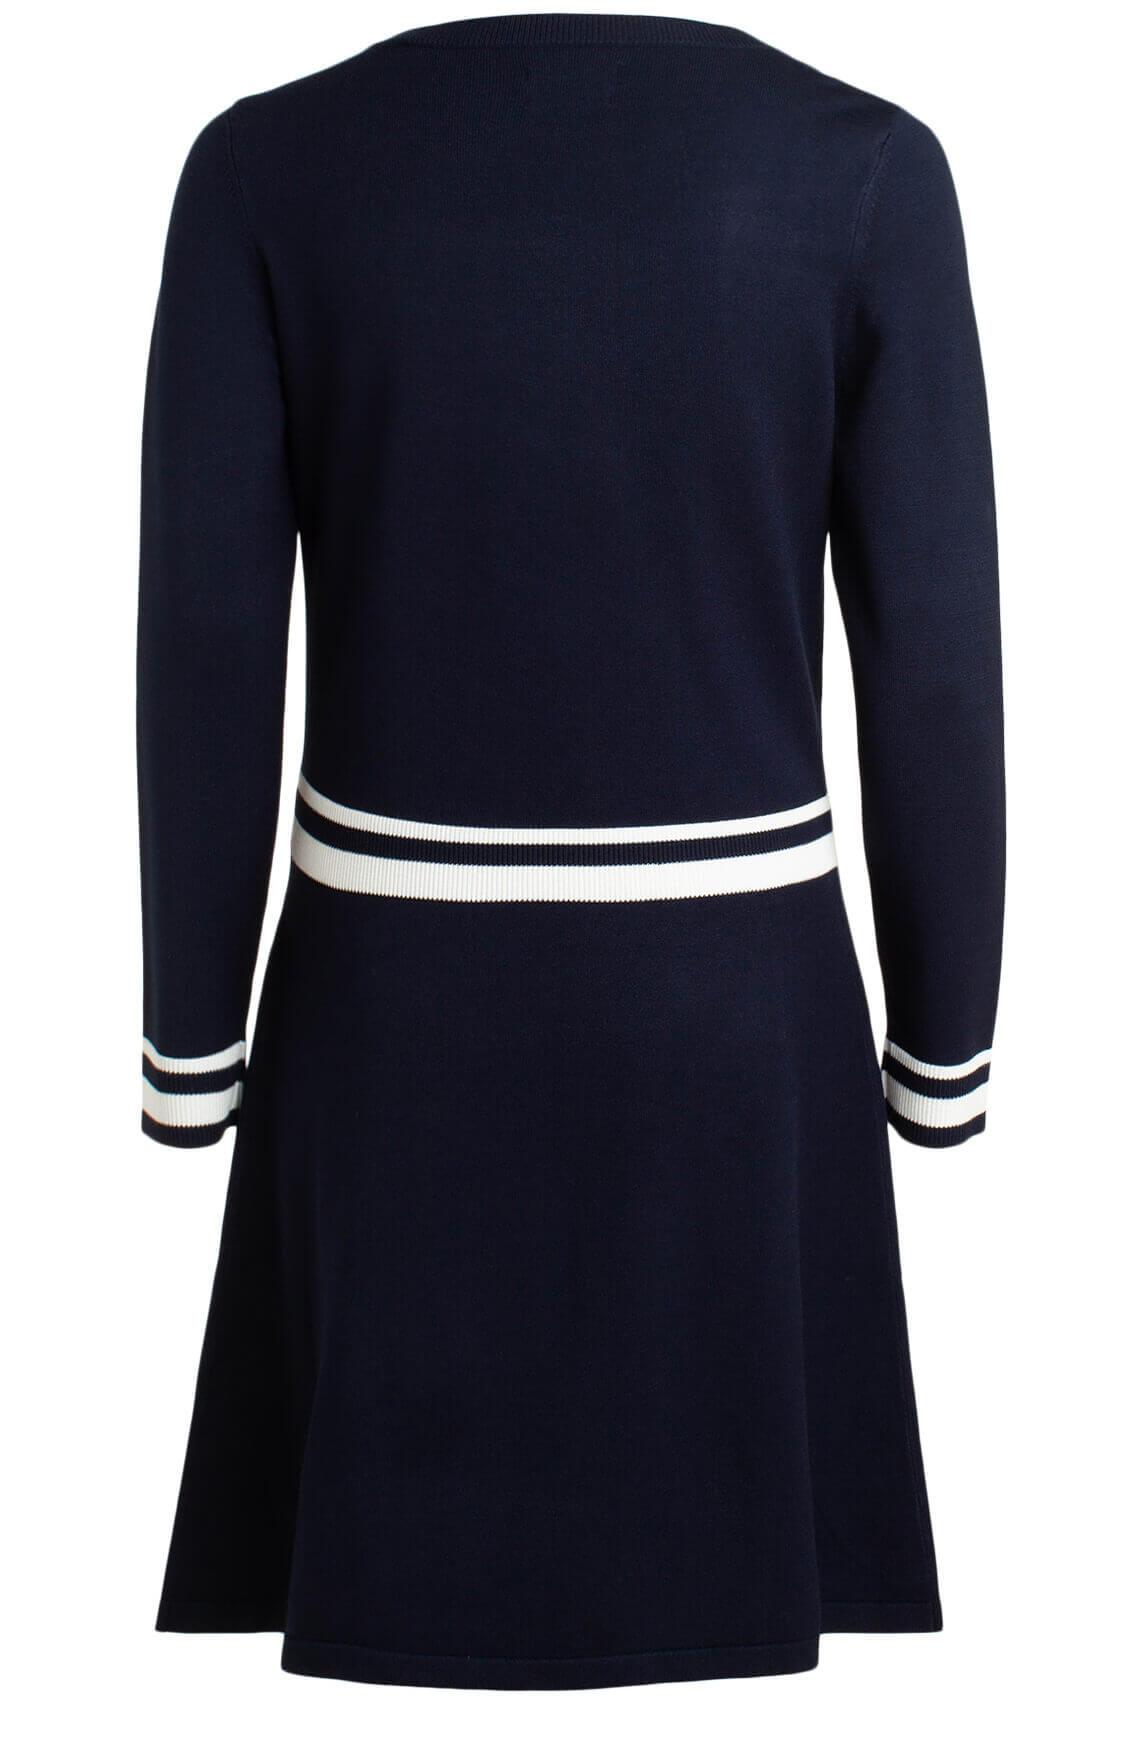 Marc O'Polo Dames Gebreide A-lijn jurk Blauw